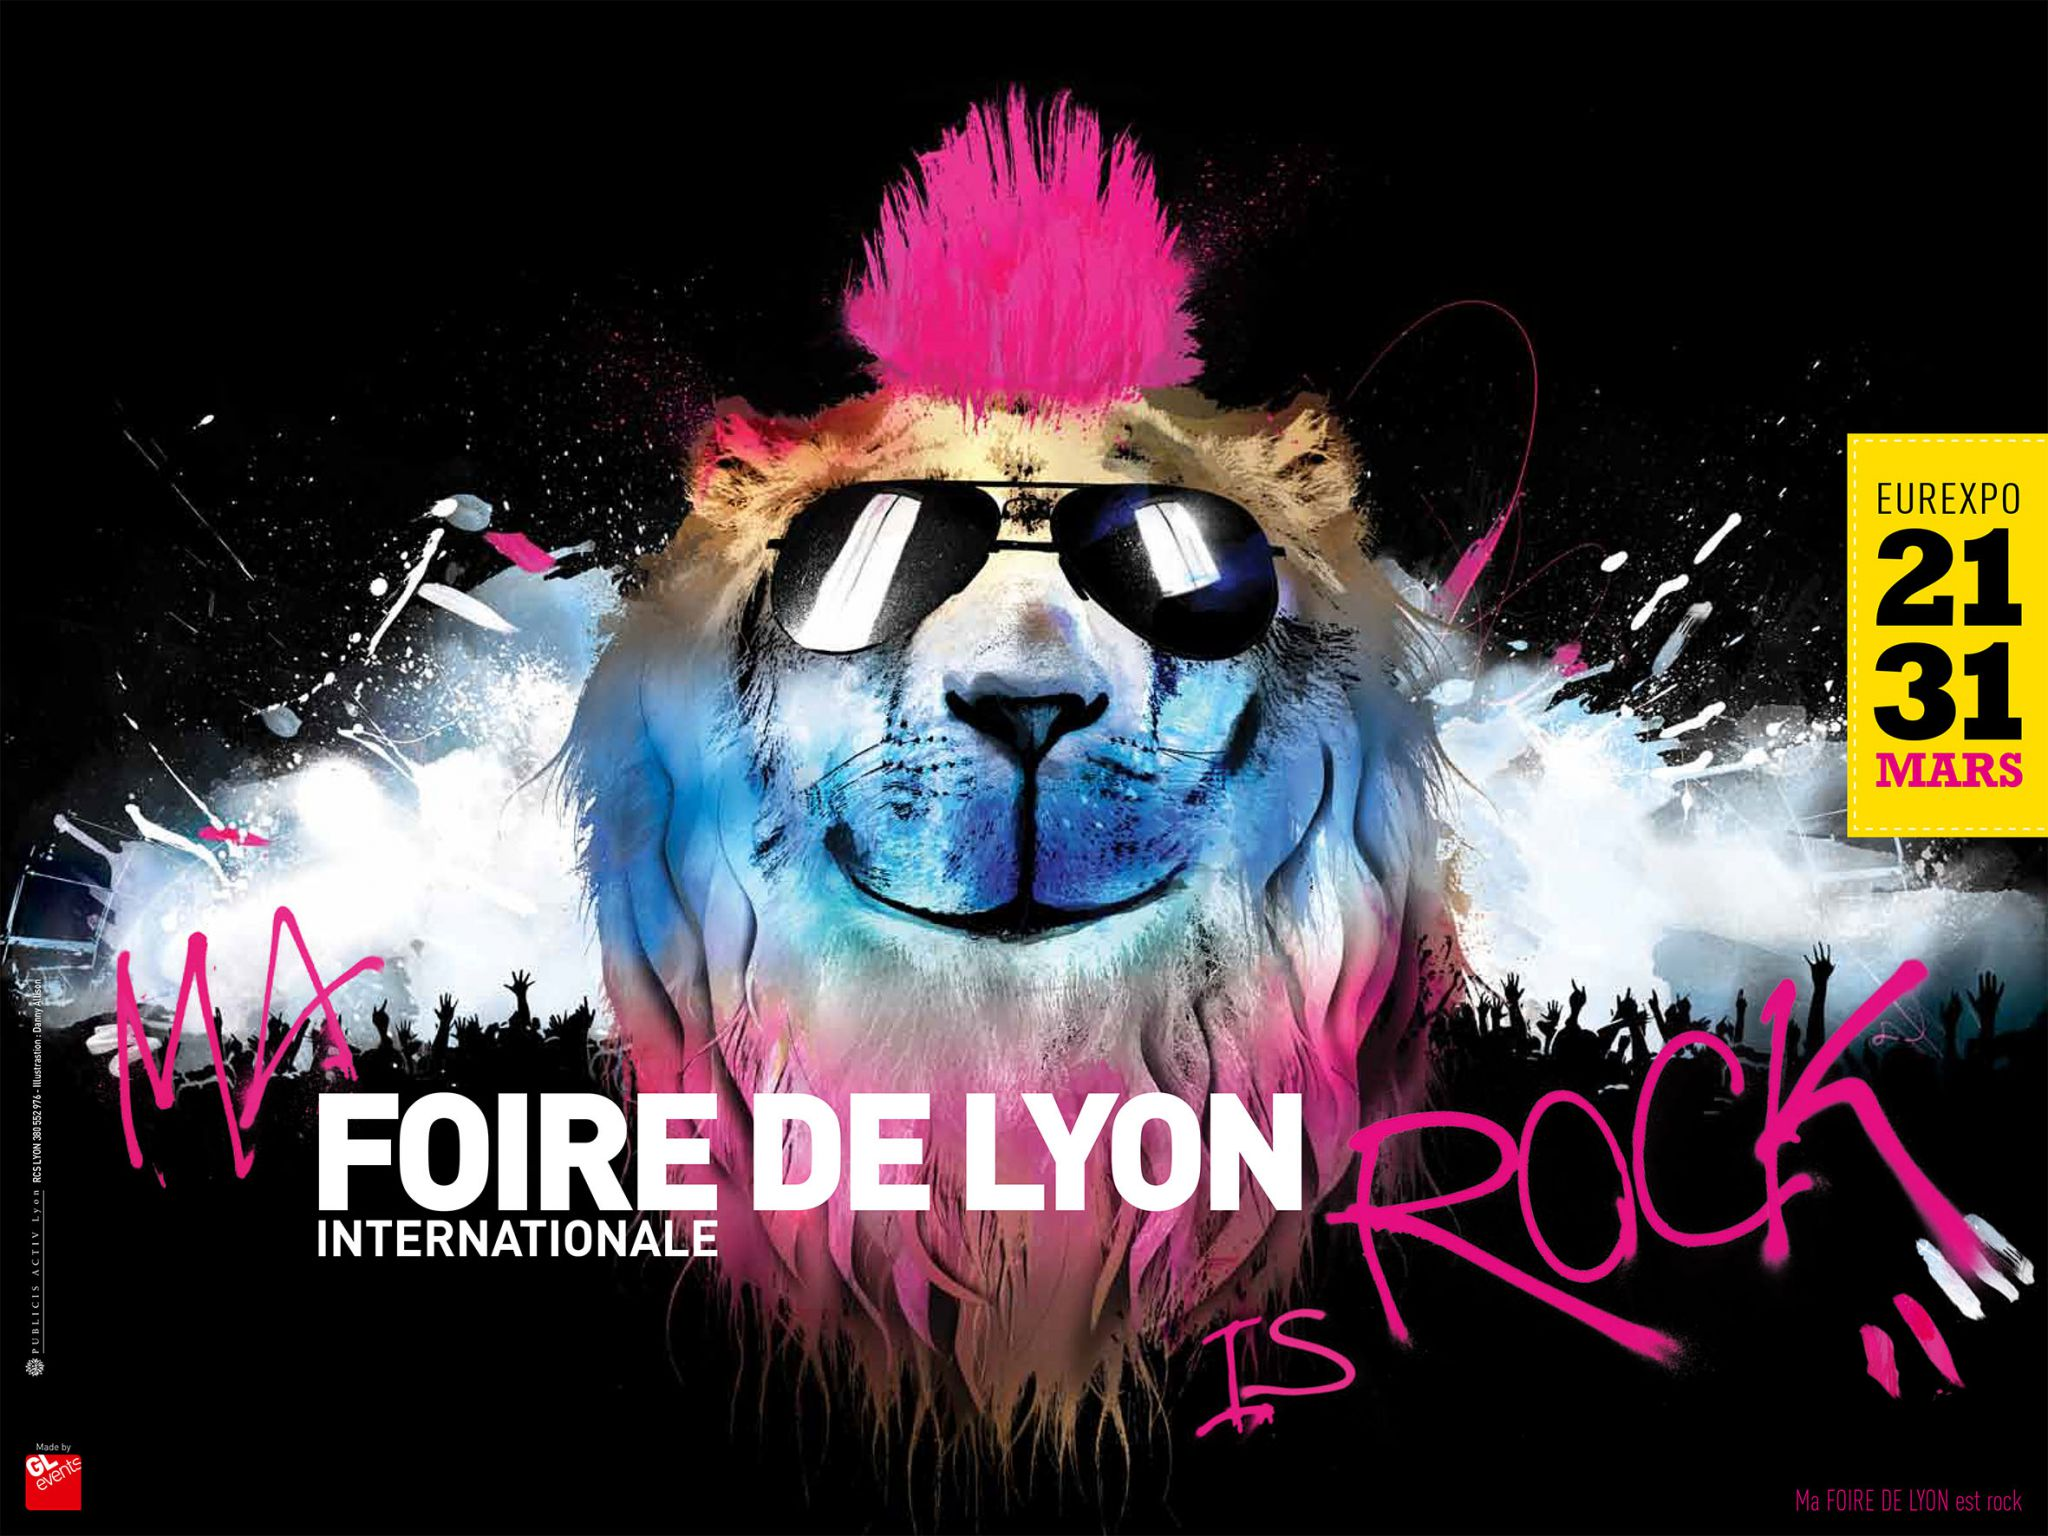 Foire de Lyon 2014 Rock Philippe Manoeuvre